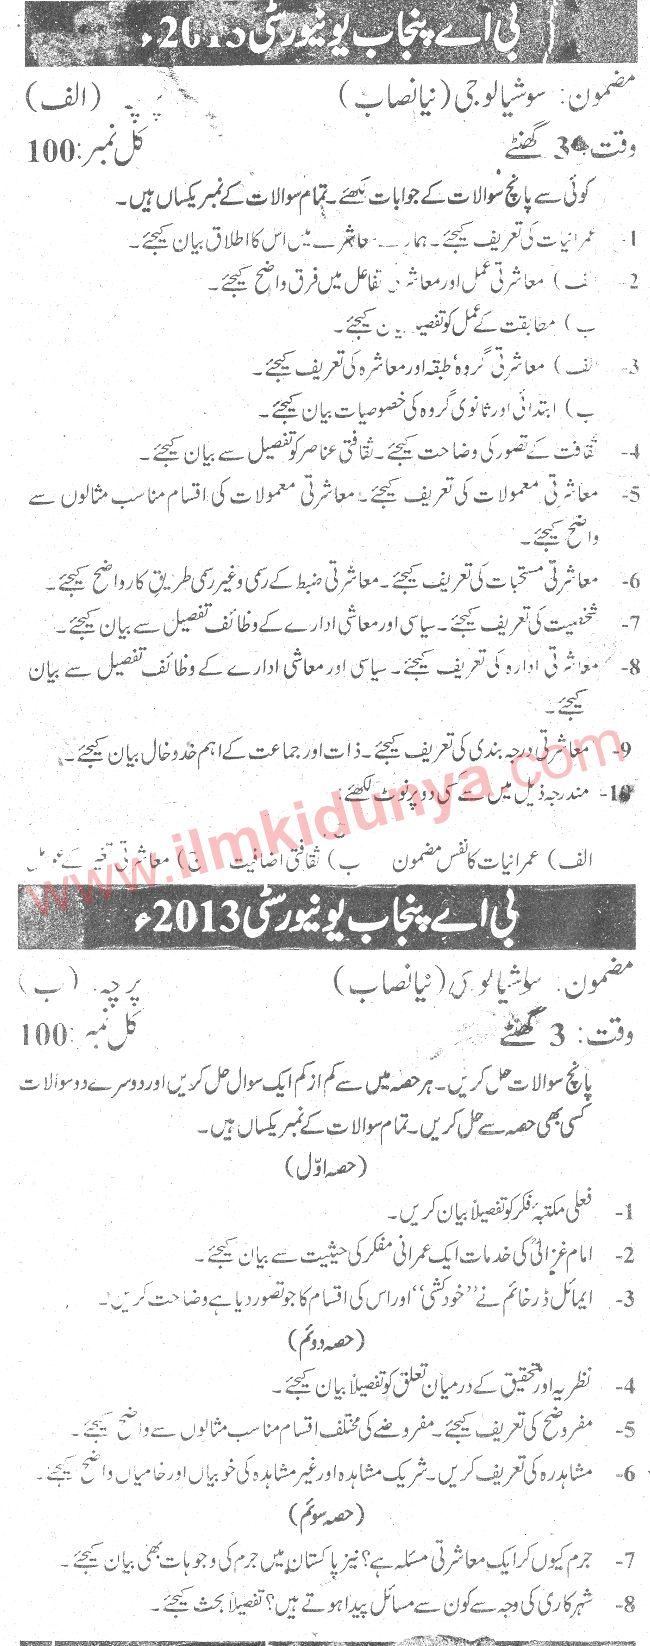 punjab university papers Admission test sample papers & past papers university of the punjab (ias) - sample paper for mhrm 2015-17 : university of lahore.